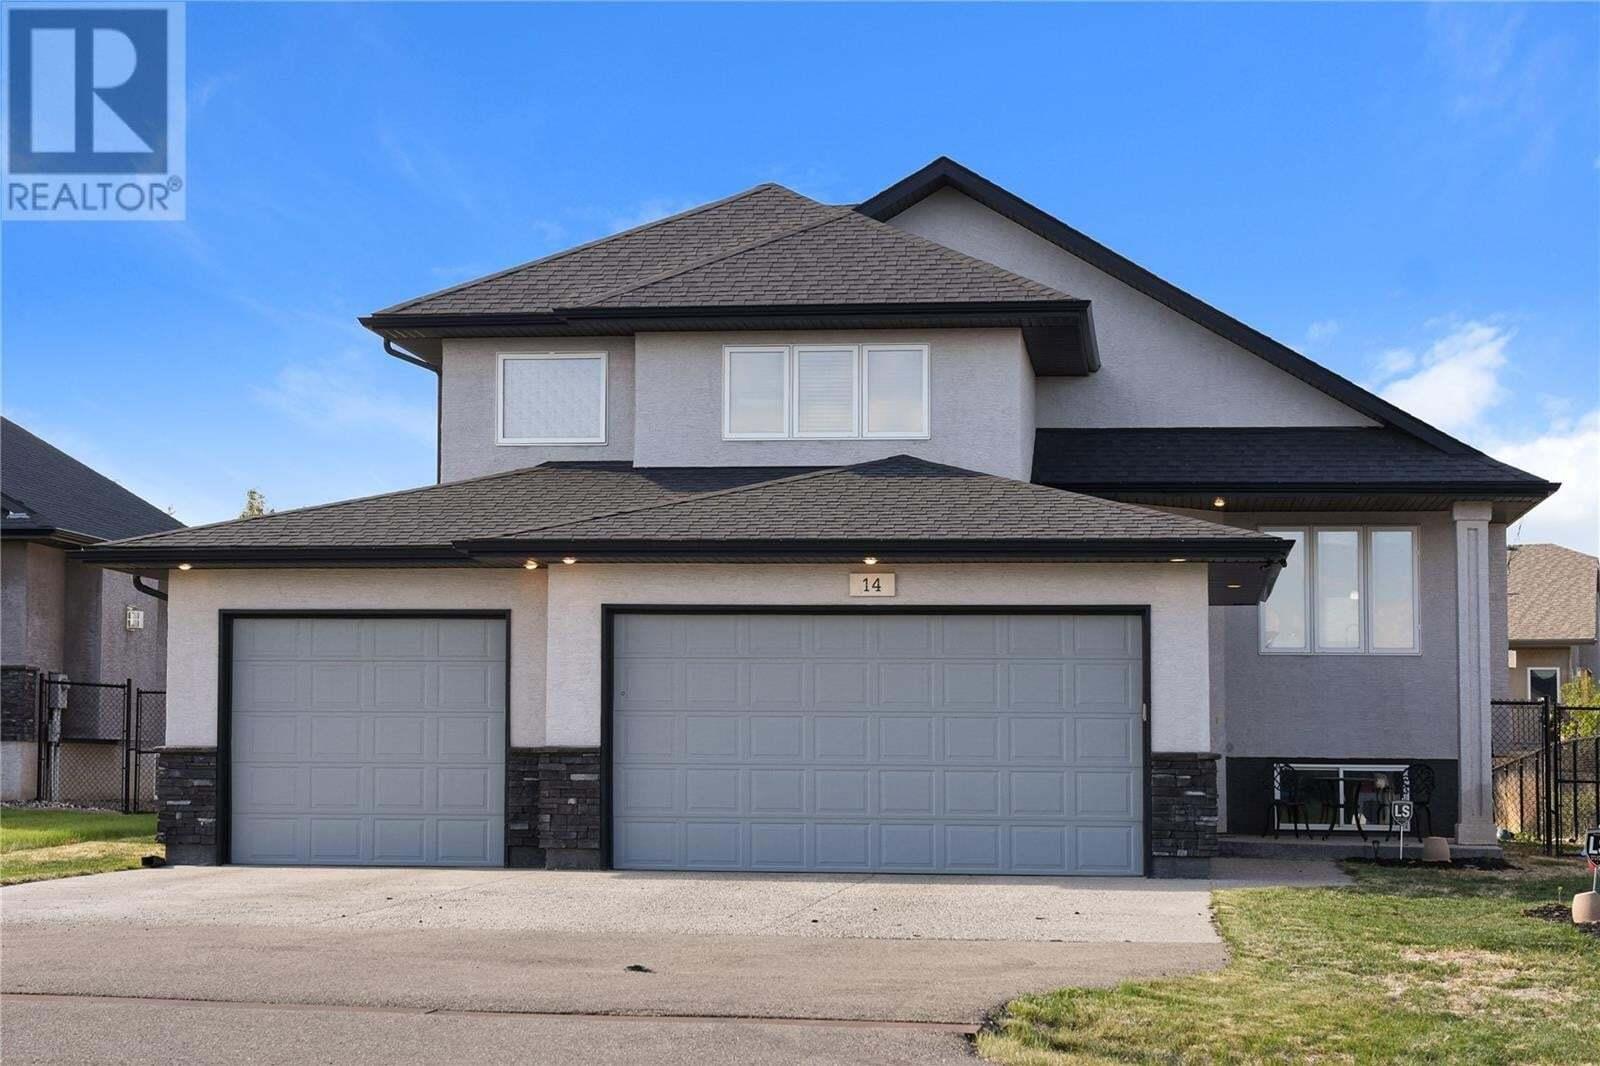 House for sale at 14 Churchill Cres White City Saskatchewan - MLS: SK810725